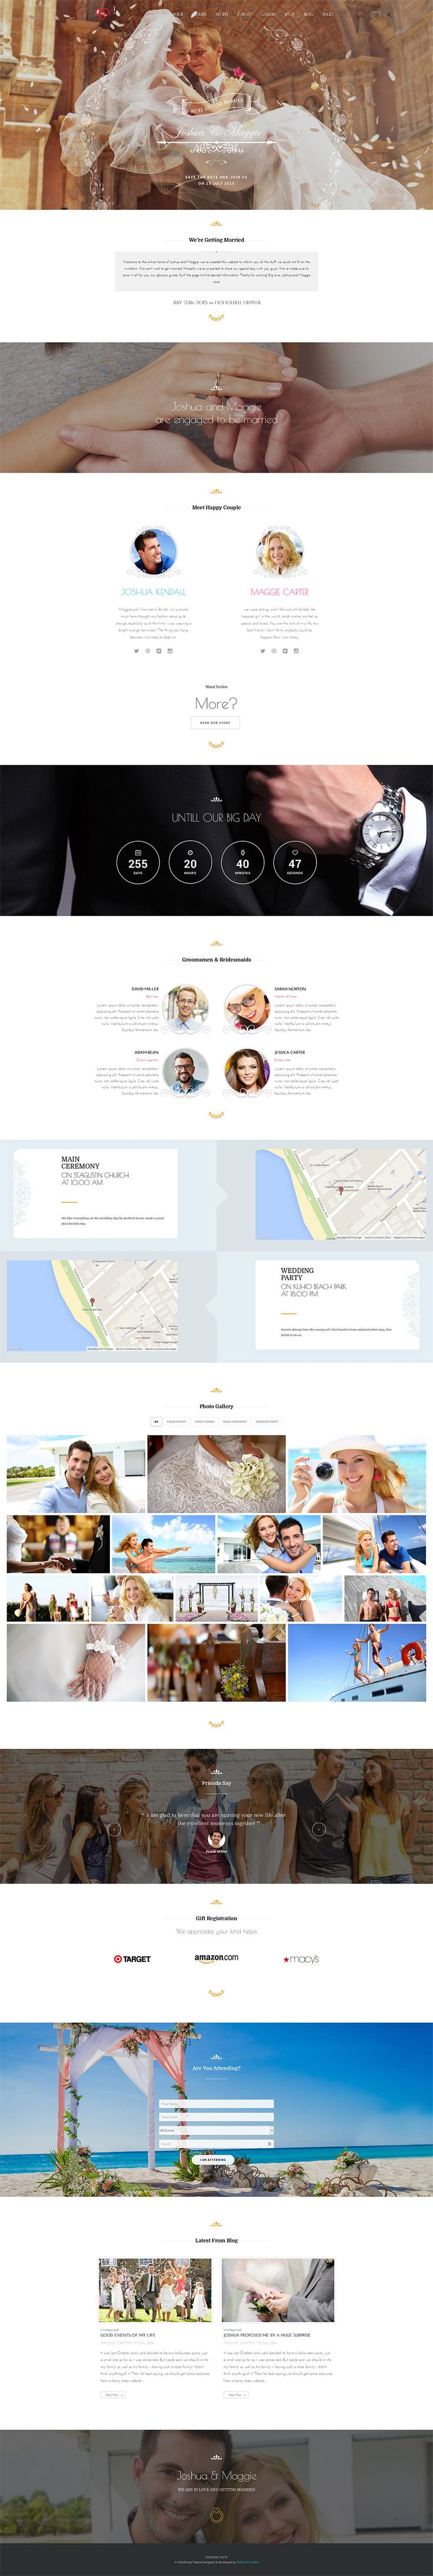 Wedding Suite - WordPress Wedding Theme #website #wedding #web #wordpress #wp #theme [www.pinterest.com/loganless/]